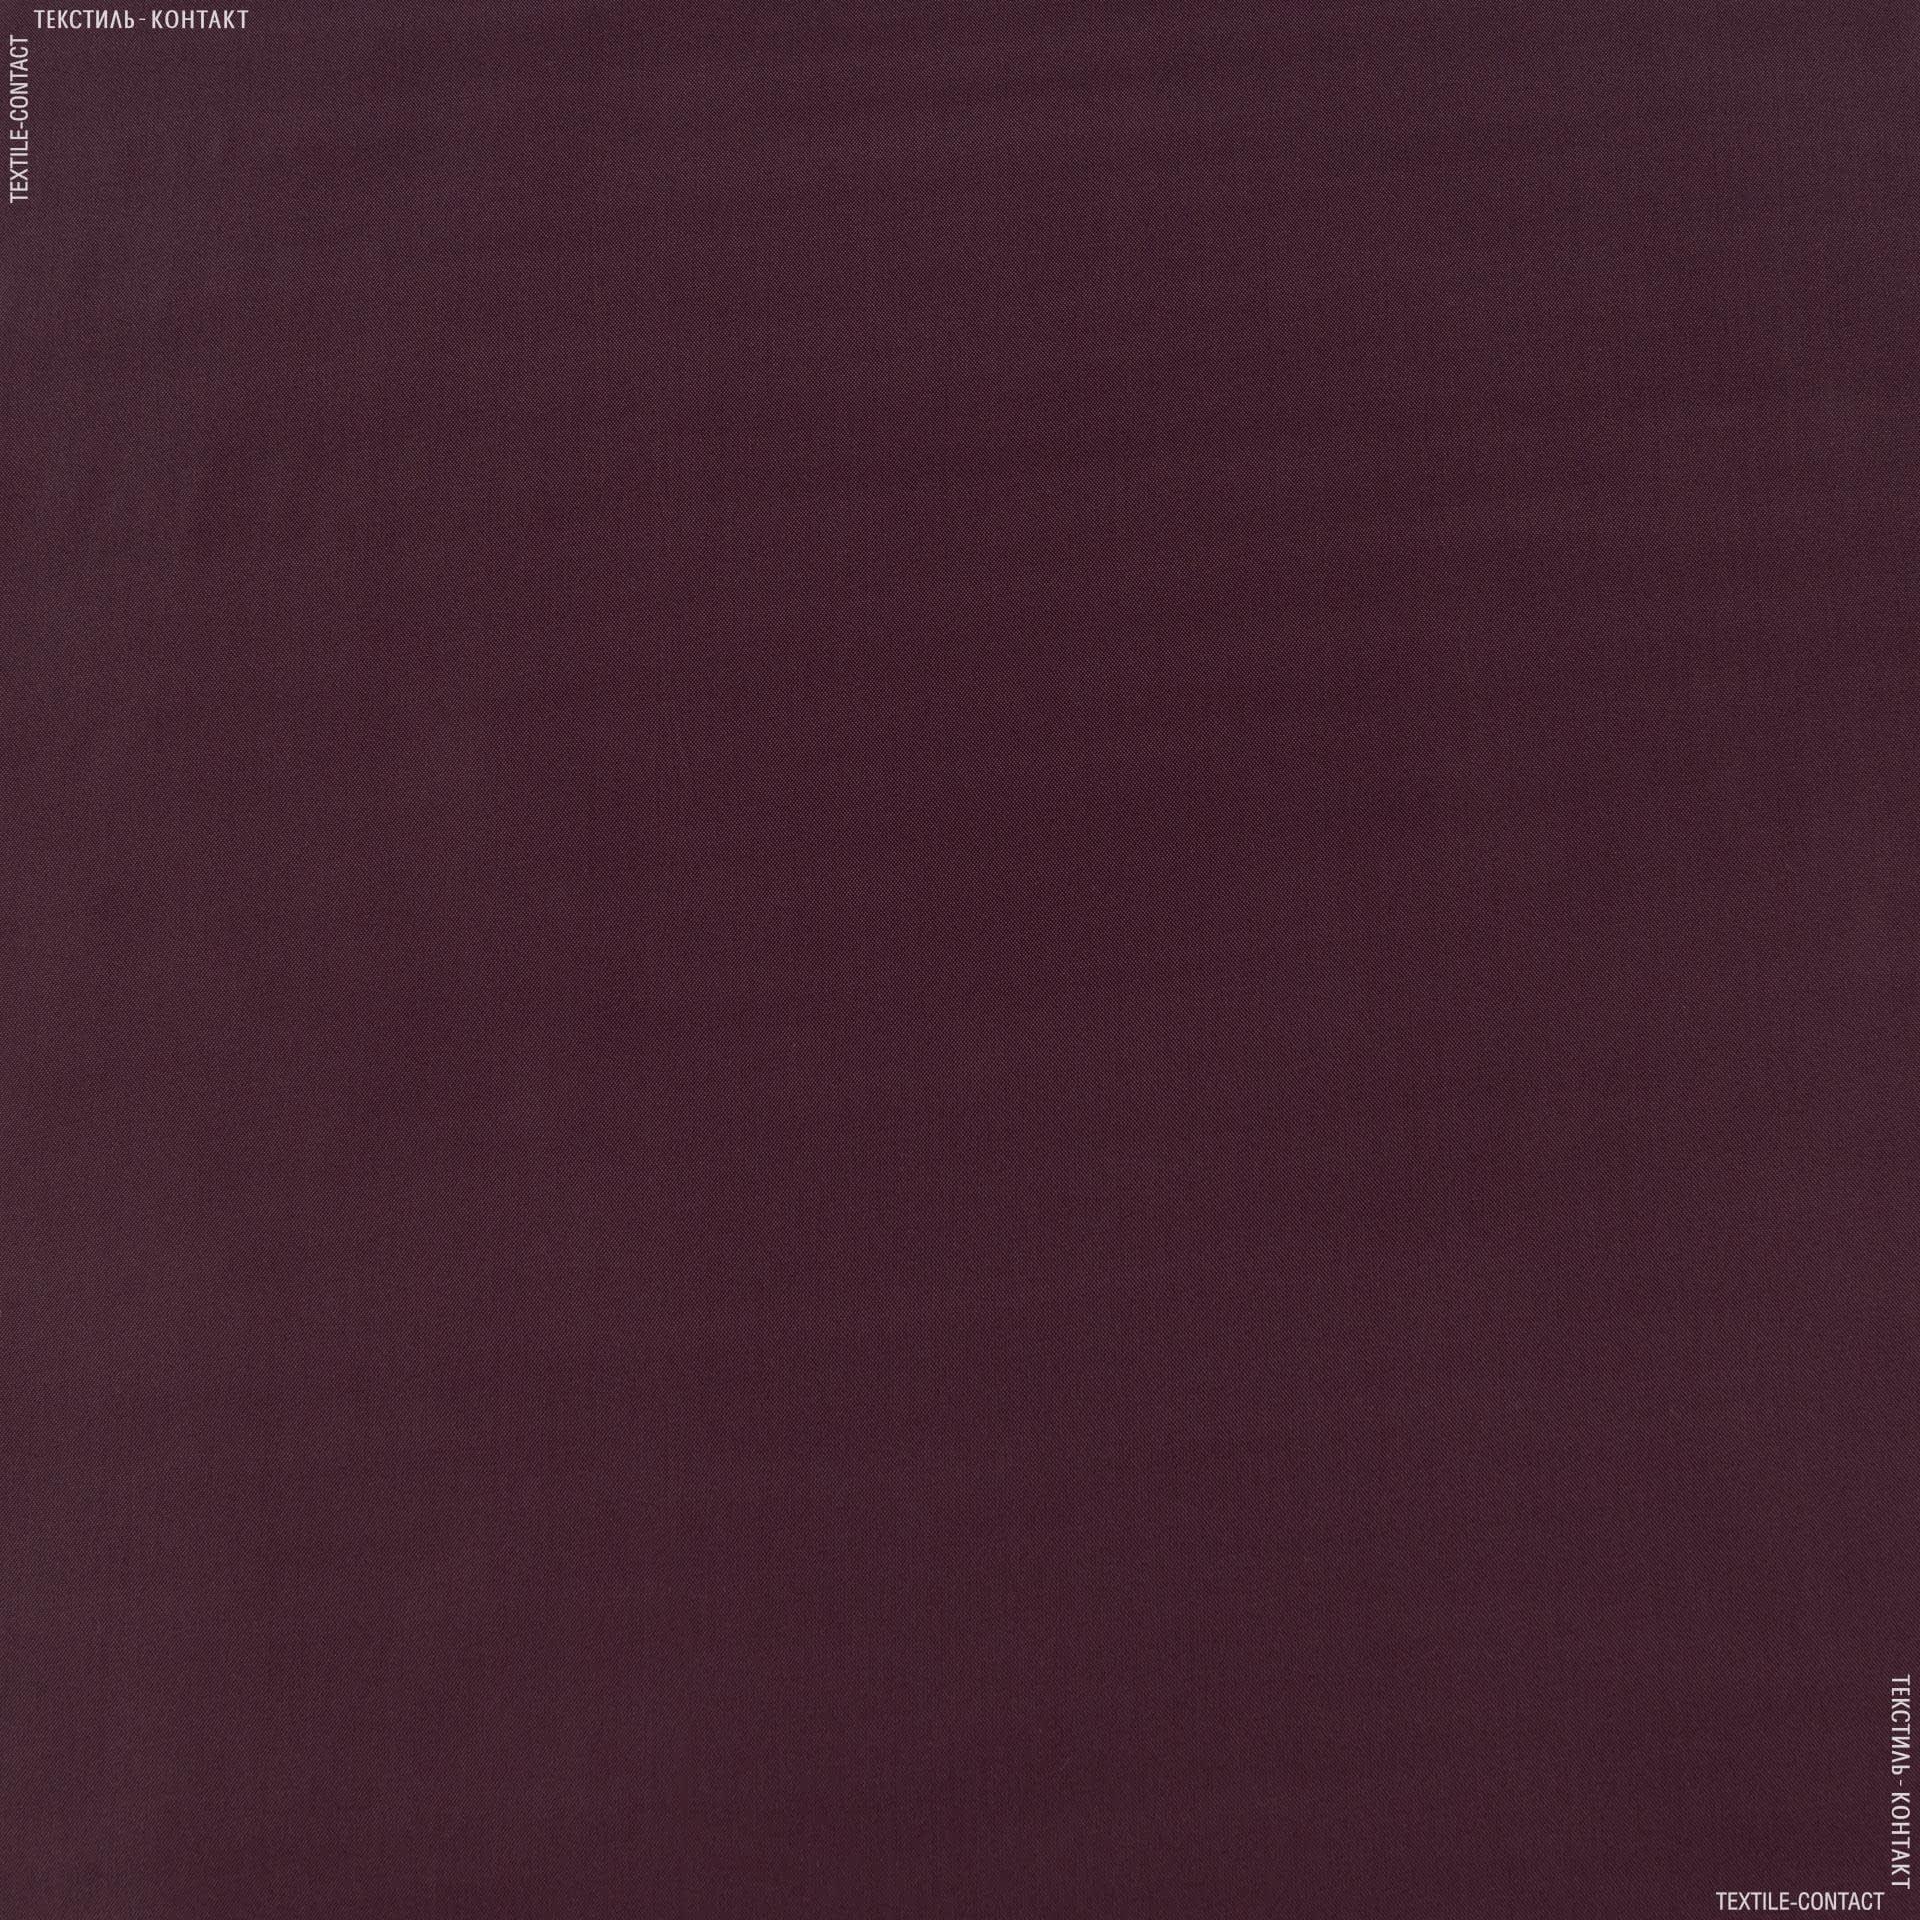 Ткани подкладочная ткань - Подкладка 190 баклажан